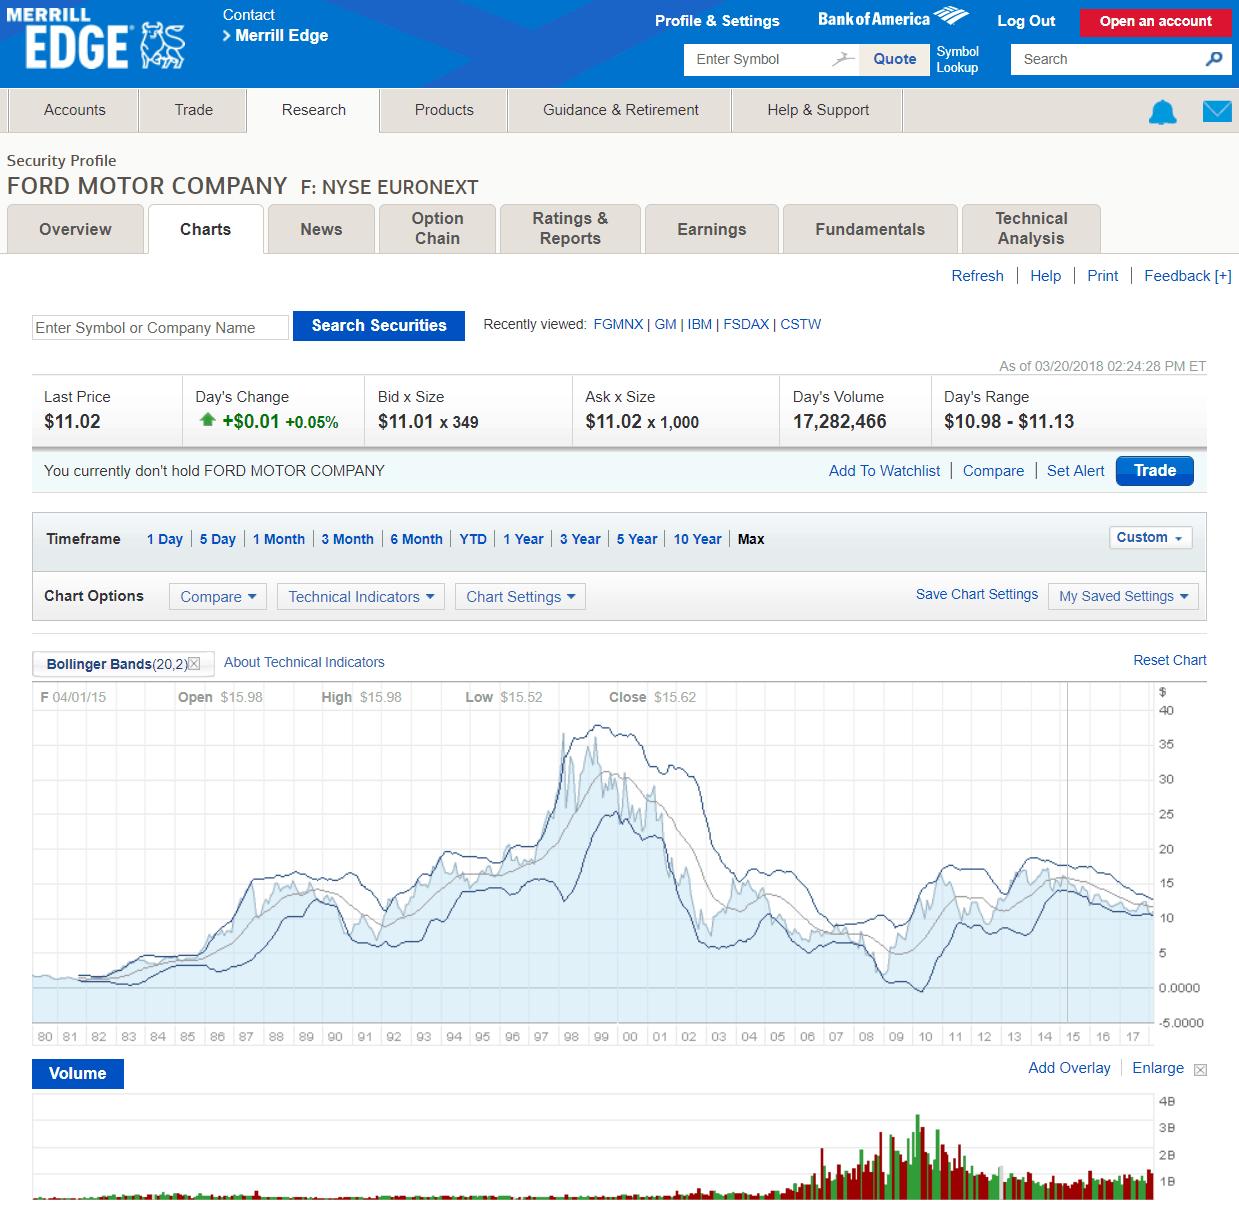 Merrill Edge Chart